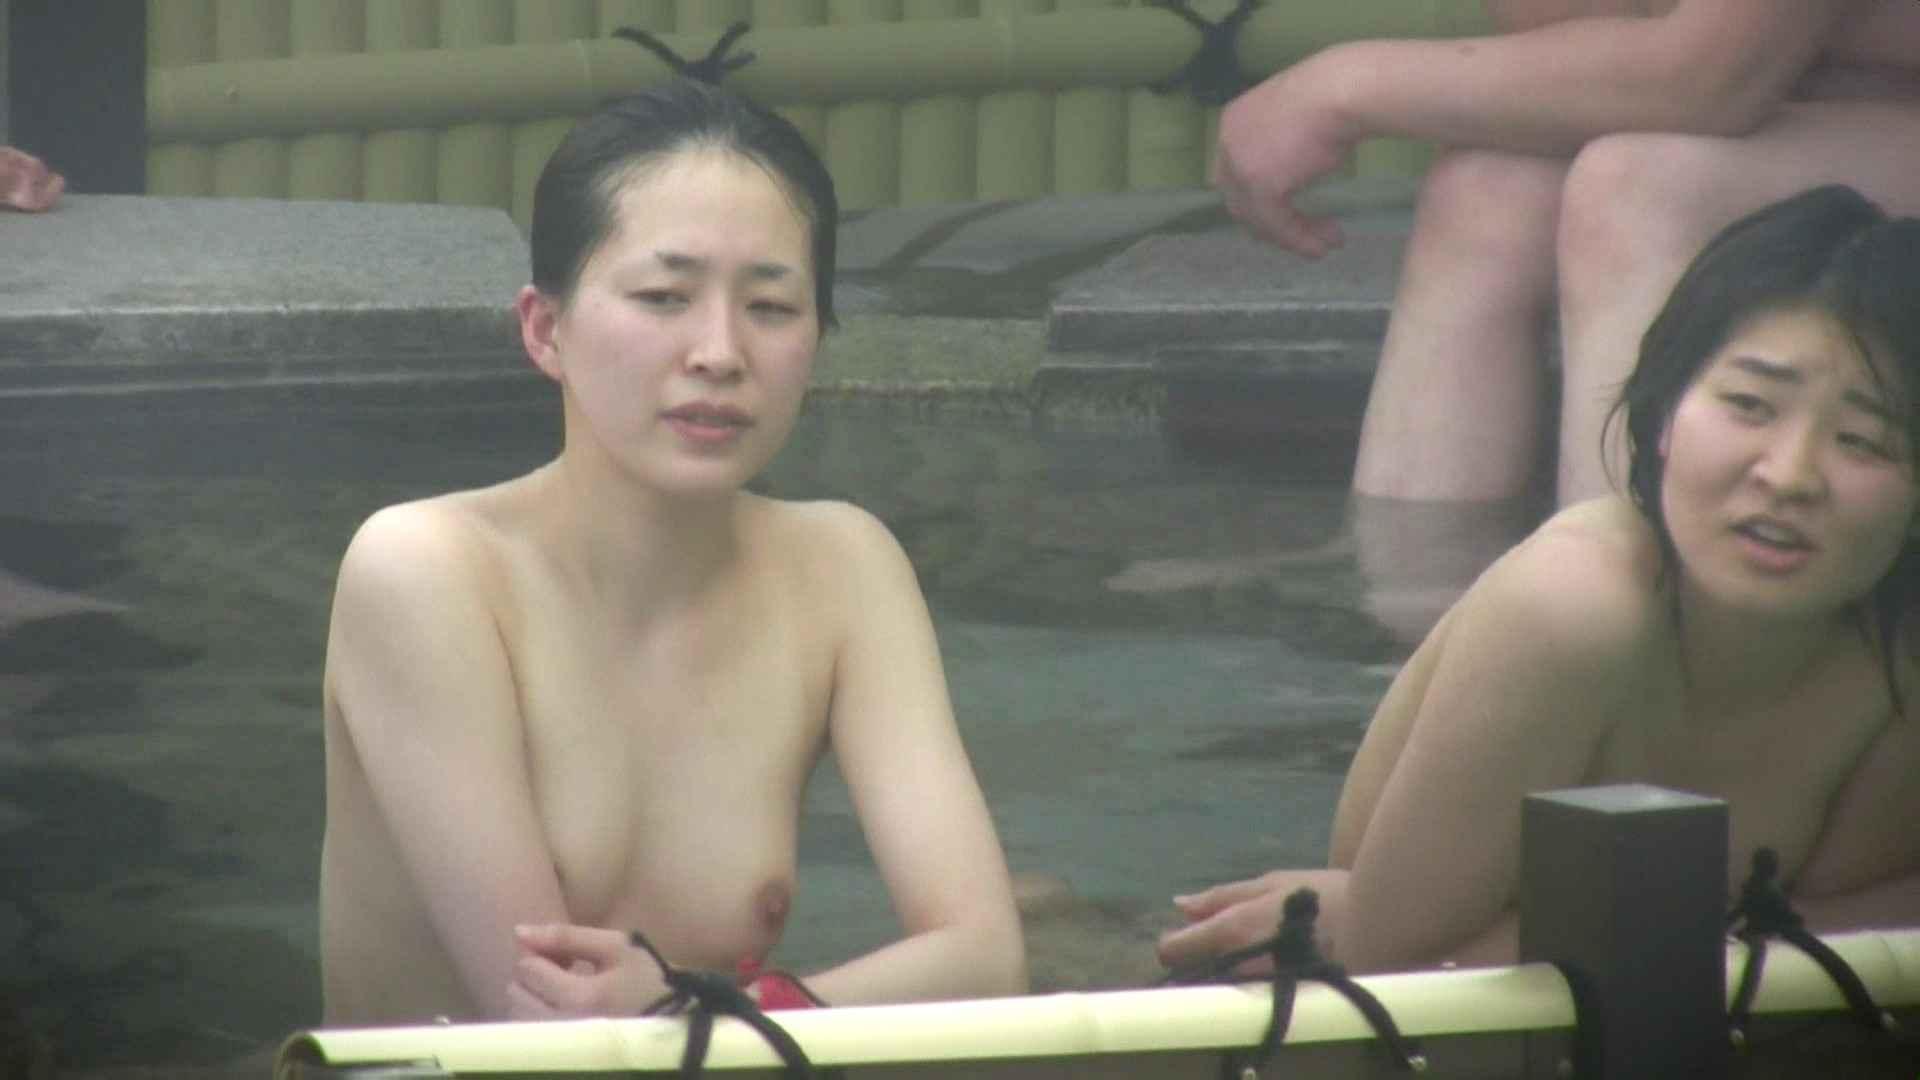 Aquaな露天風呂Vol.583 美しいOLの裸体 すけべAV動画紹介 103pic 29